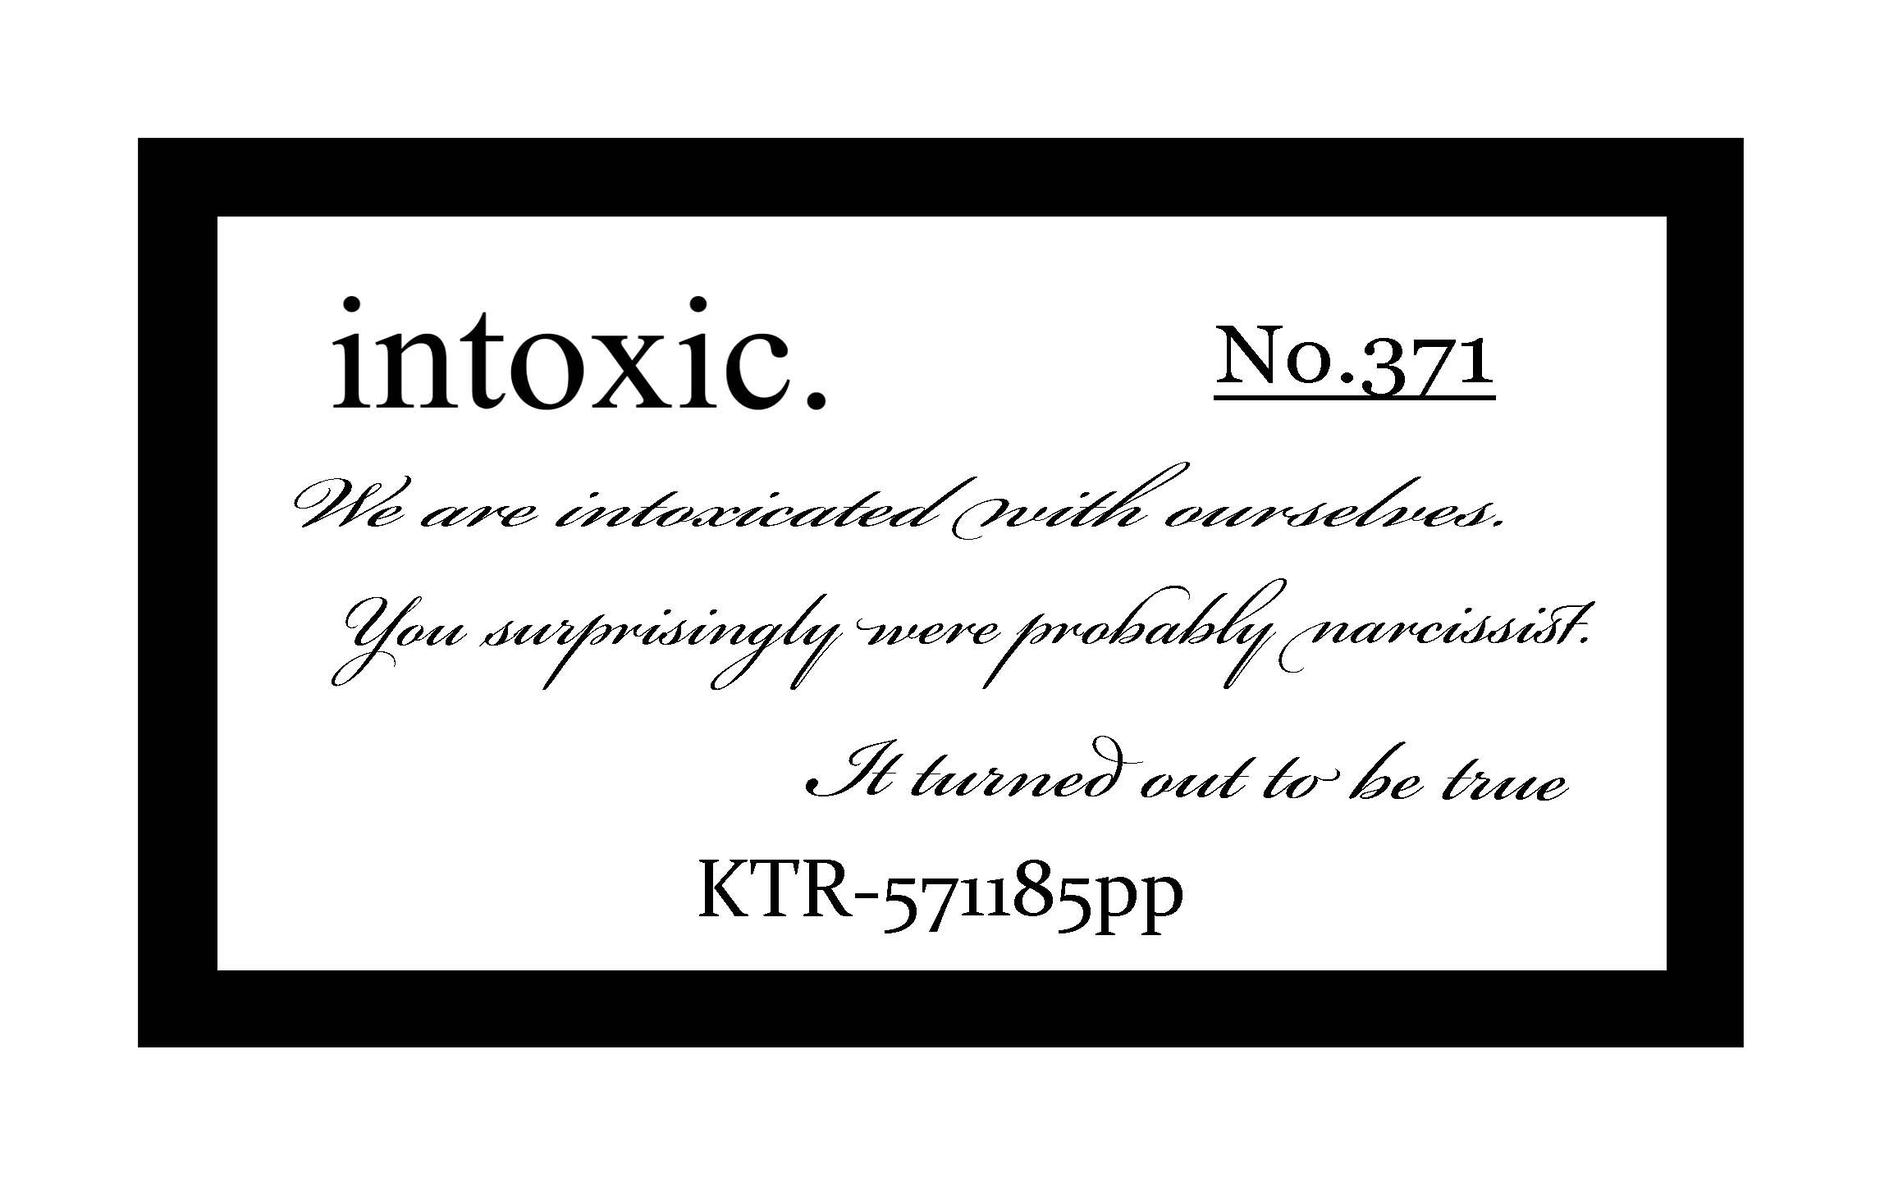 intoxic.